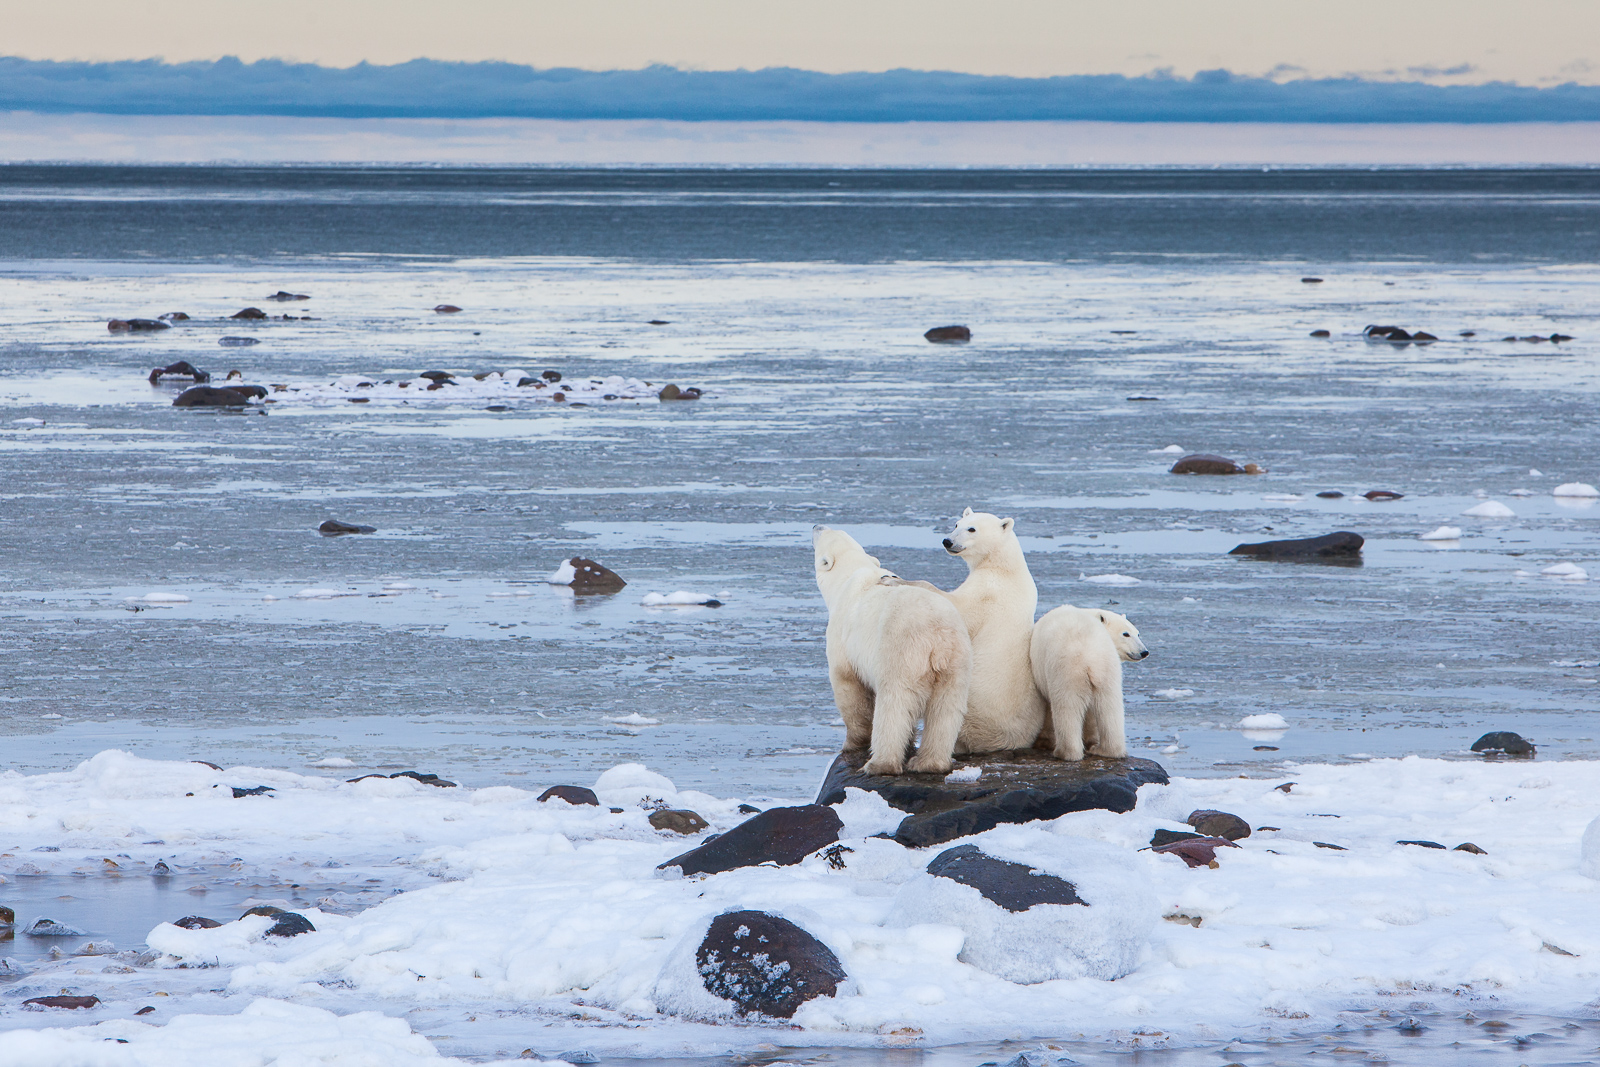 Waiting for the Hunt,Polar bear,Wildlife,Winter,Manitoba, Canada,Ocean,Air, photo